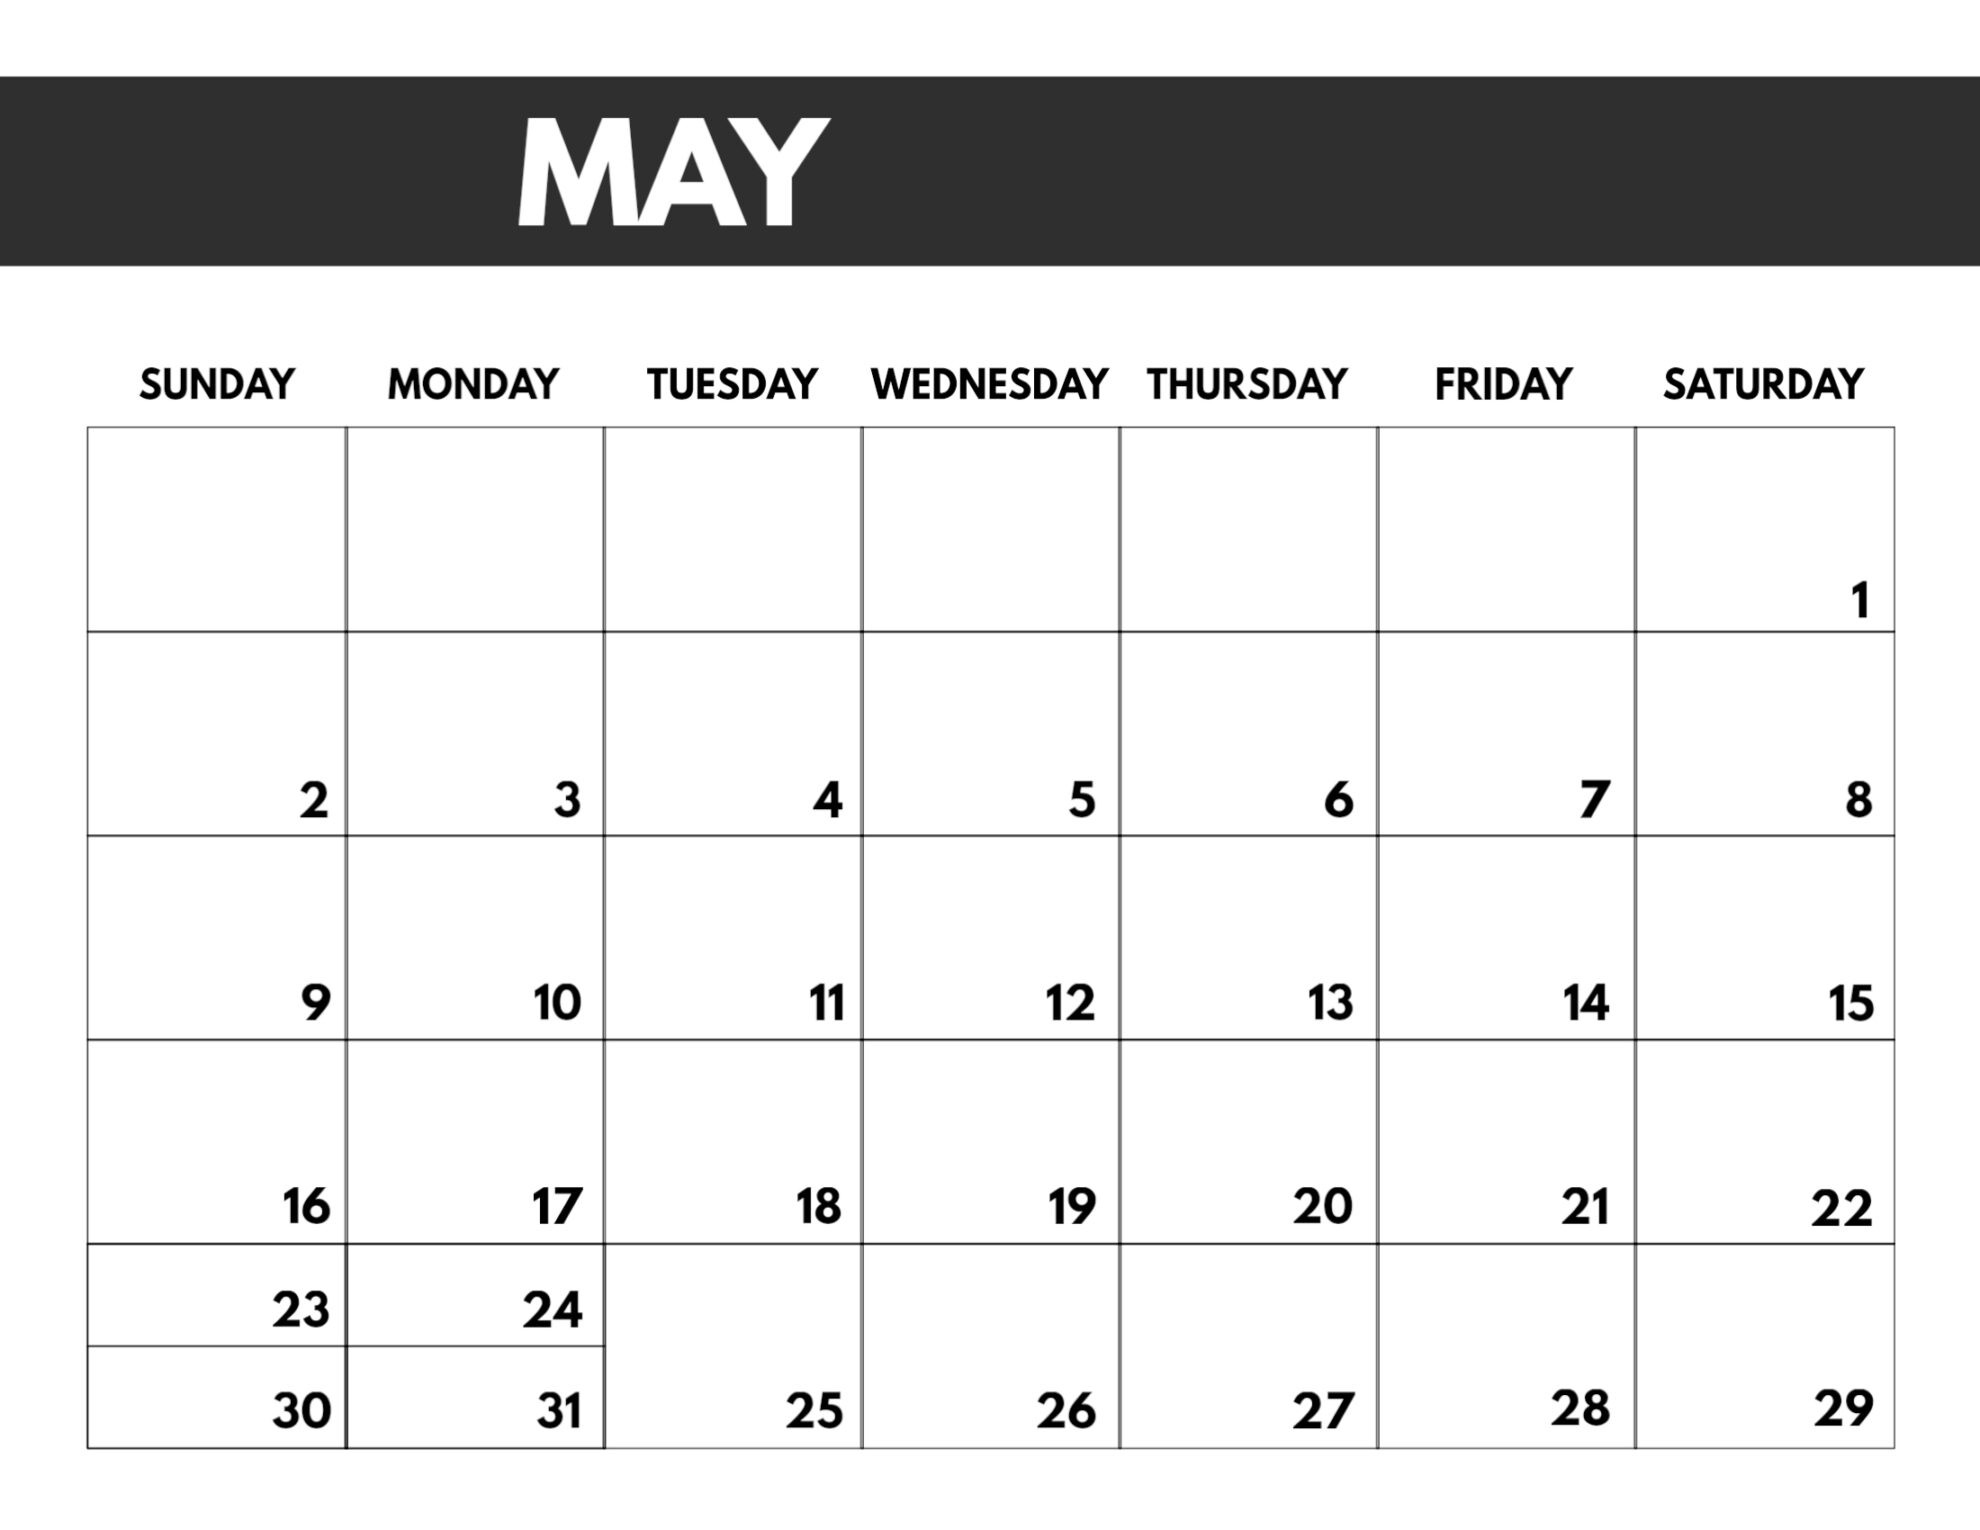 2021 Free Monthly Calendar Templates Paper Trail Design-3 Month Printable Calendar Templates 2021